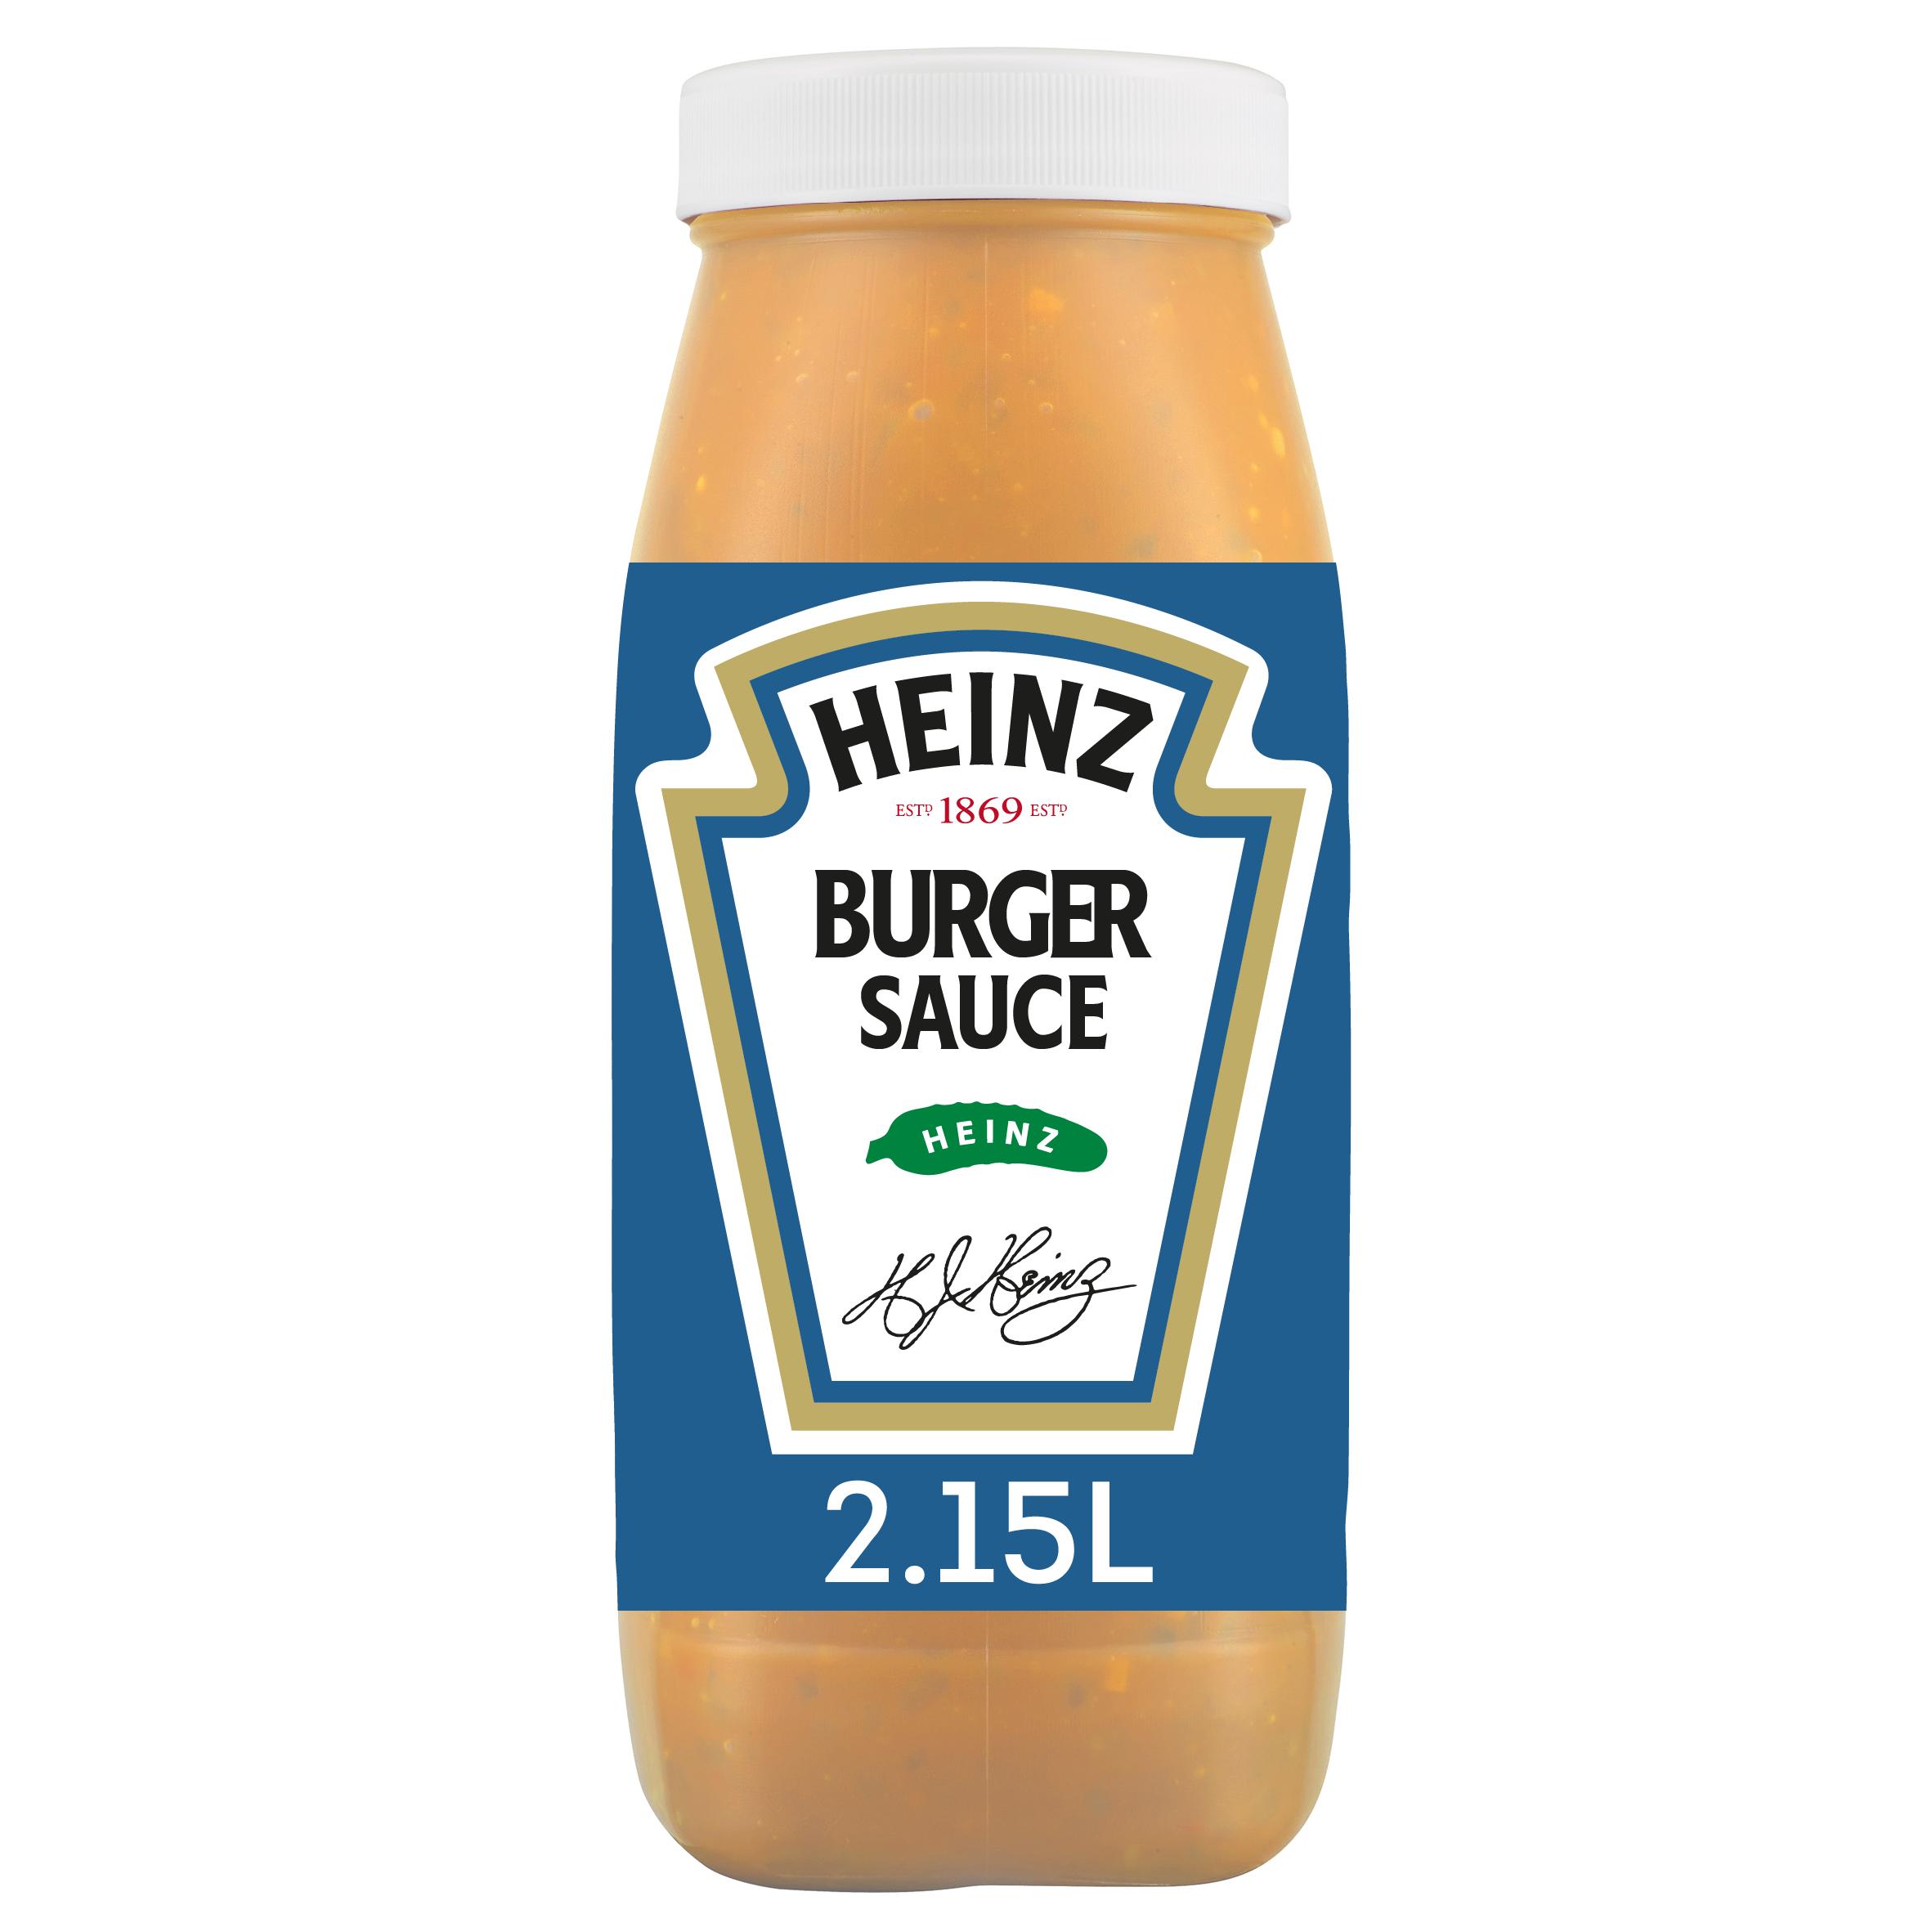 Heinz Burger Sauce Classic 2150ml image